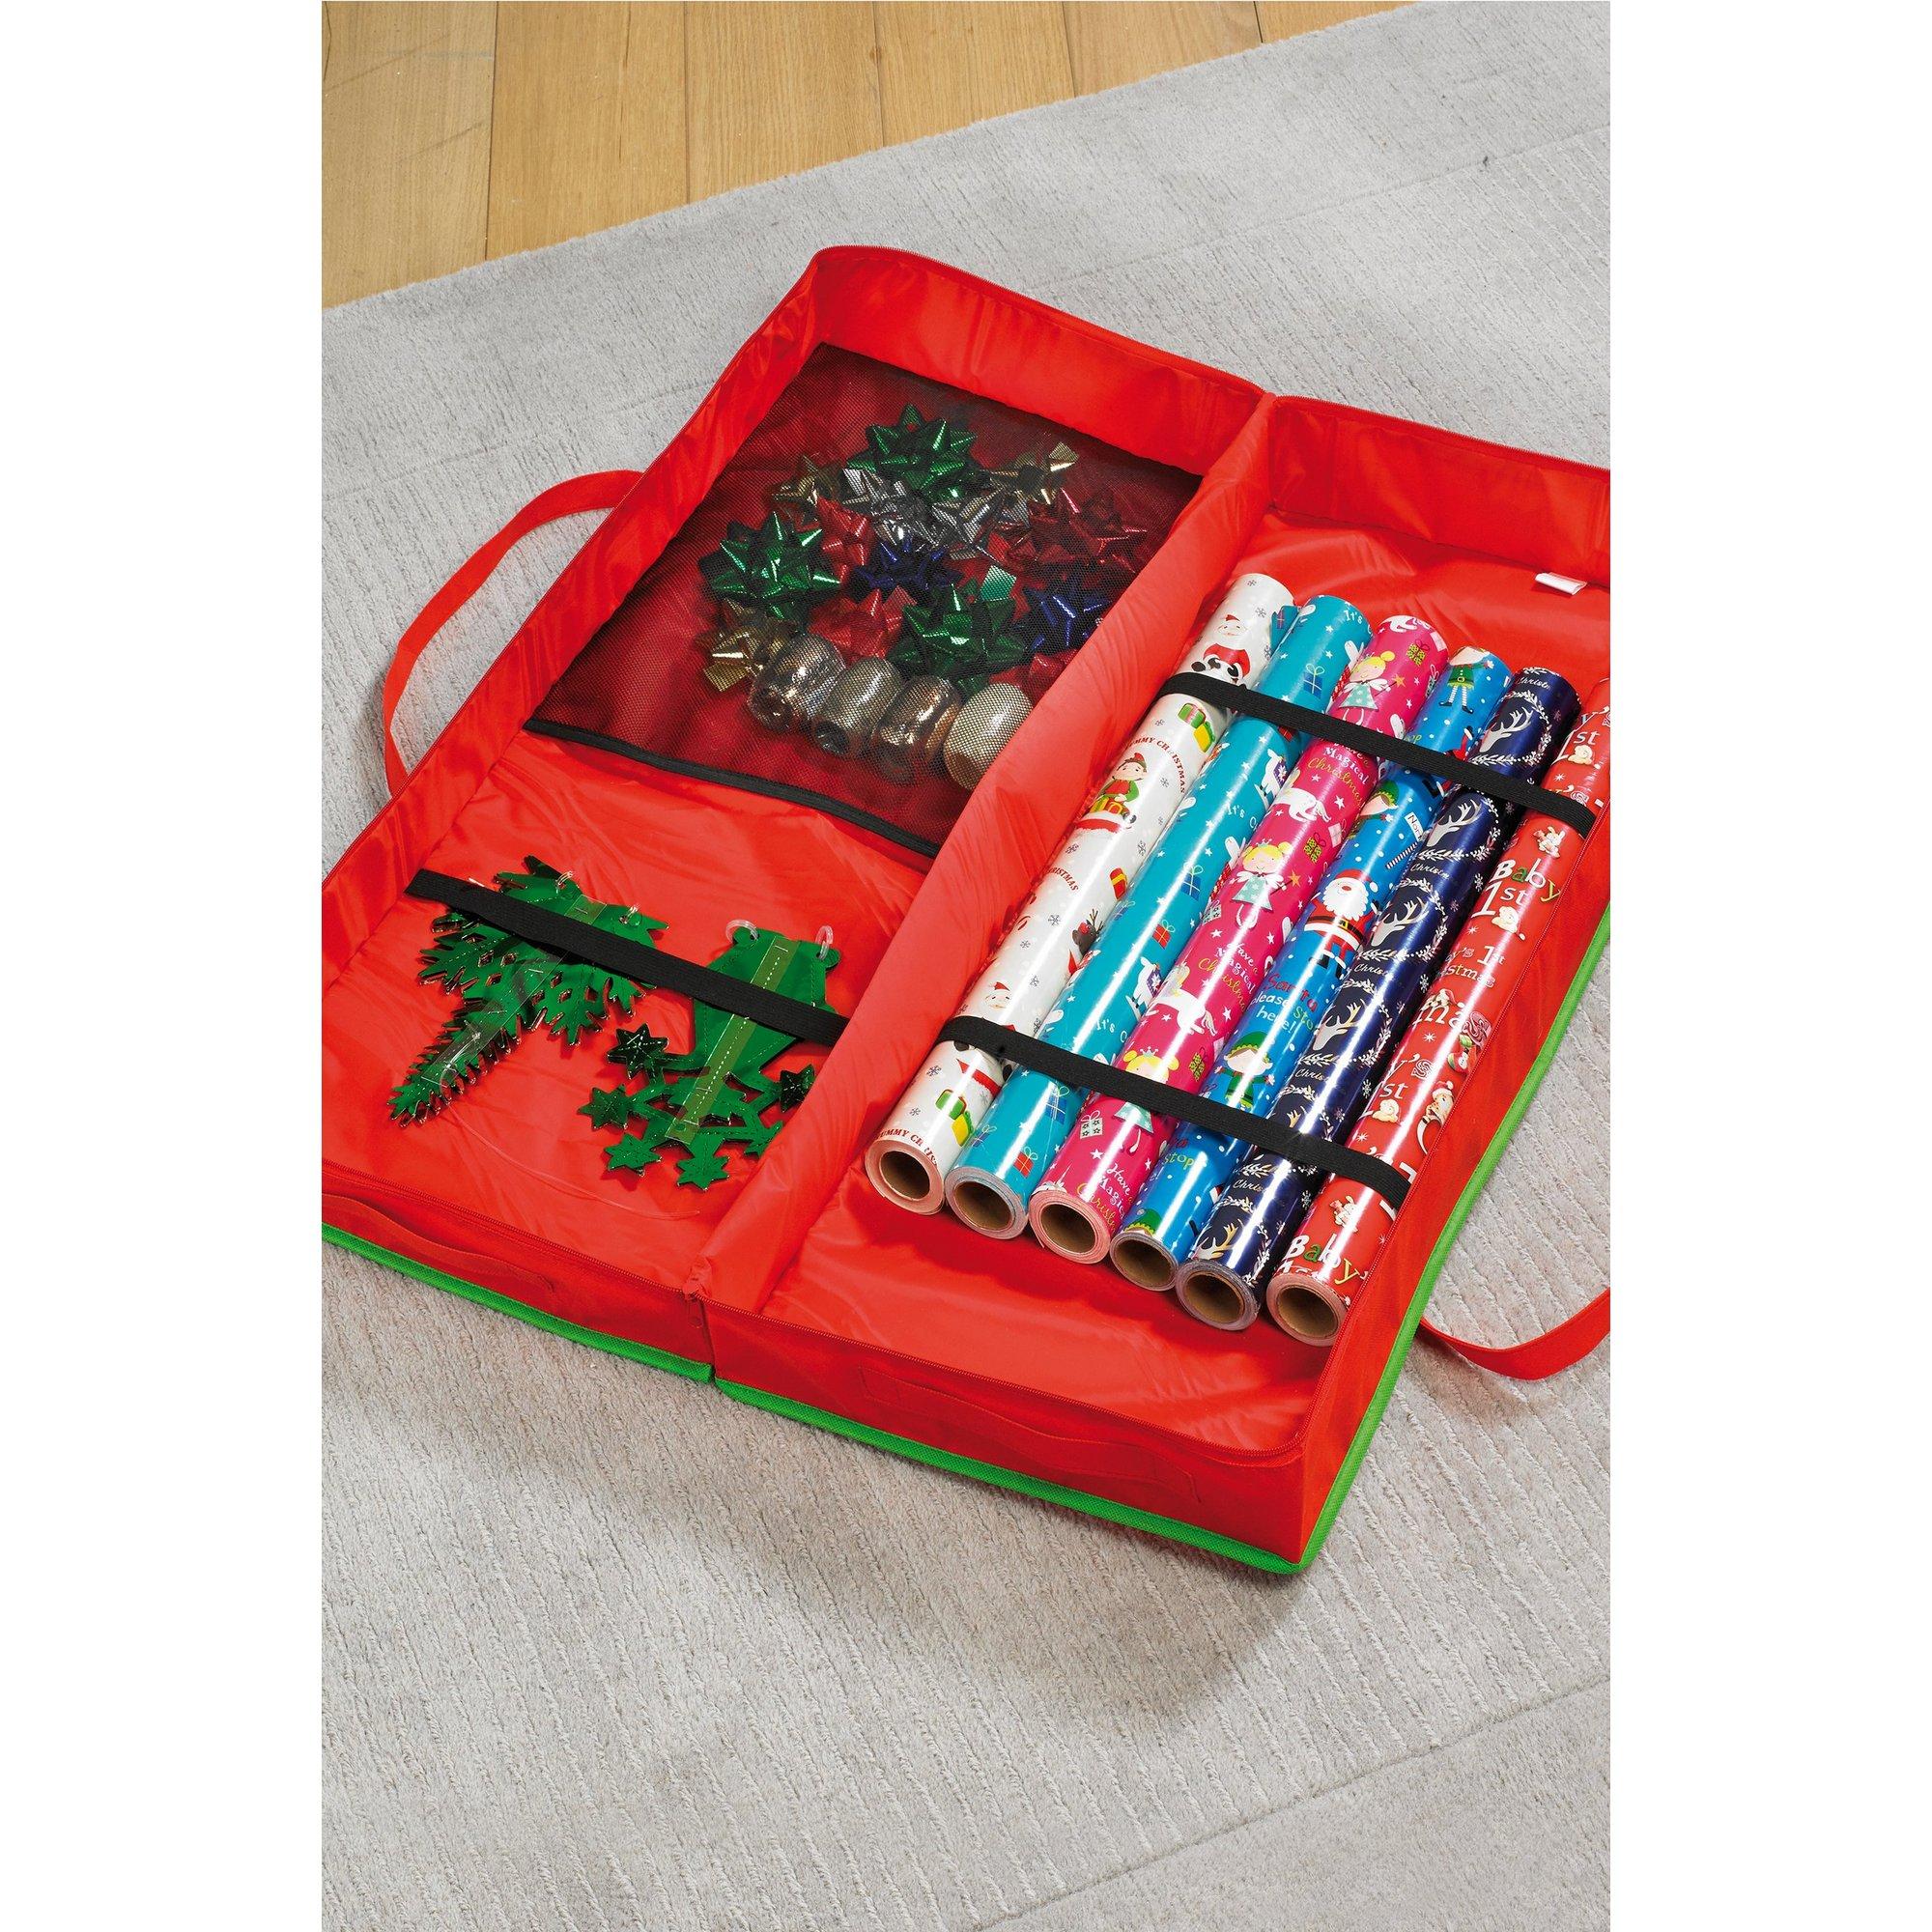 Image of Christmas Gift Wrap Organiser